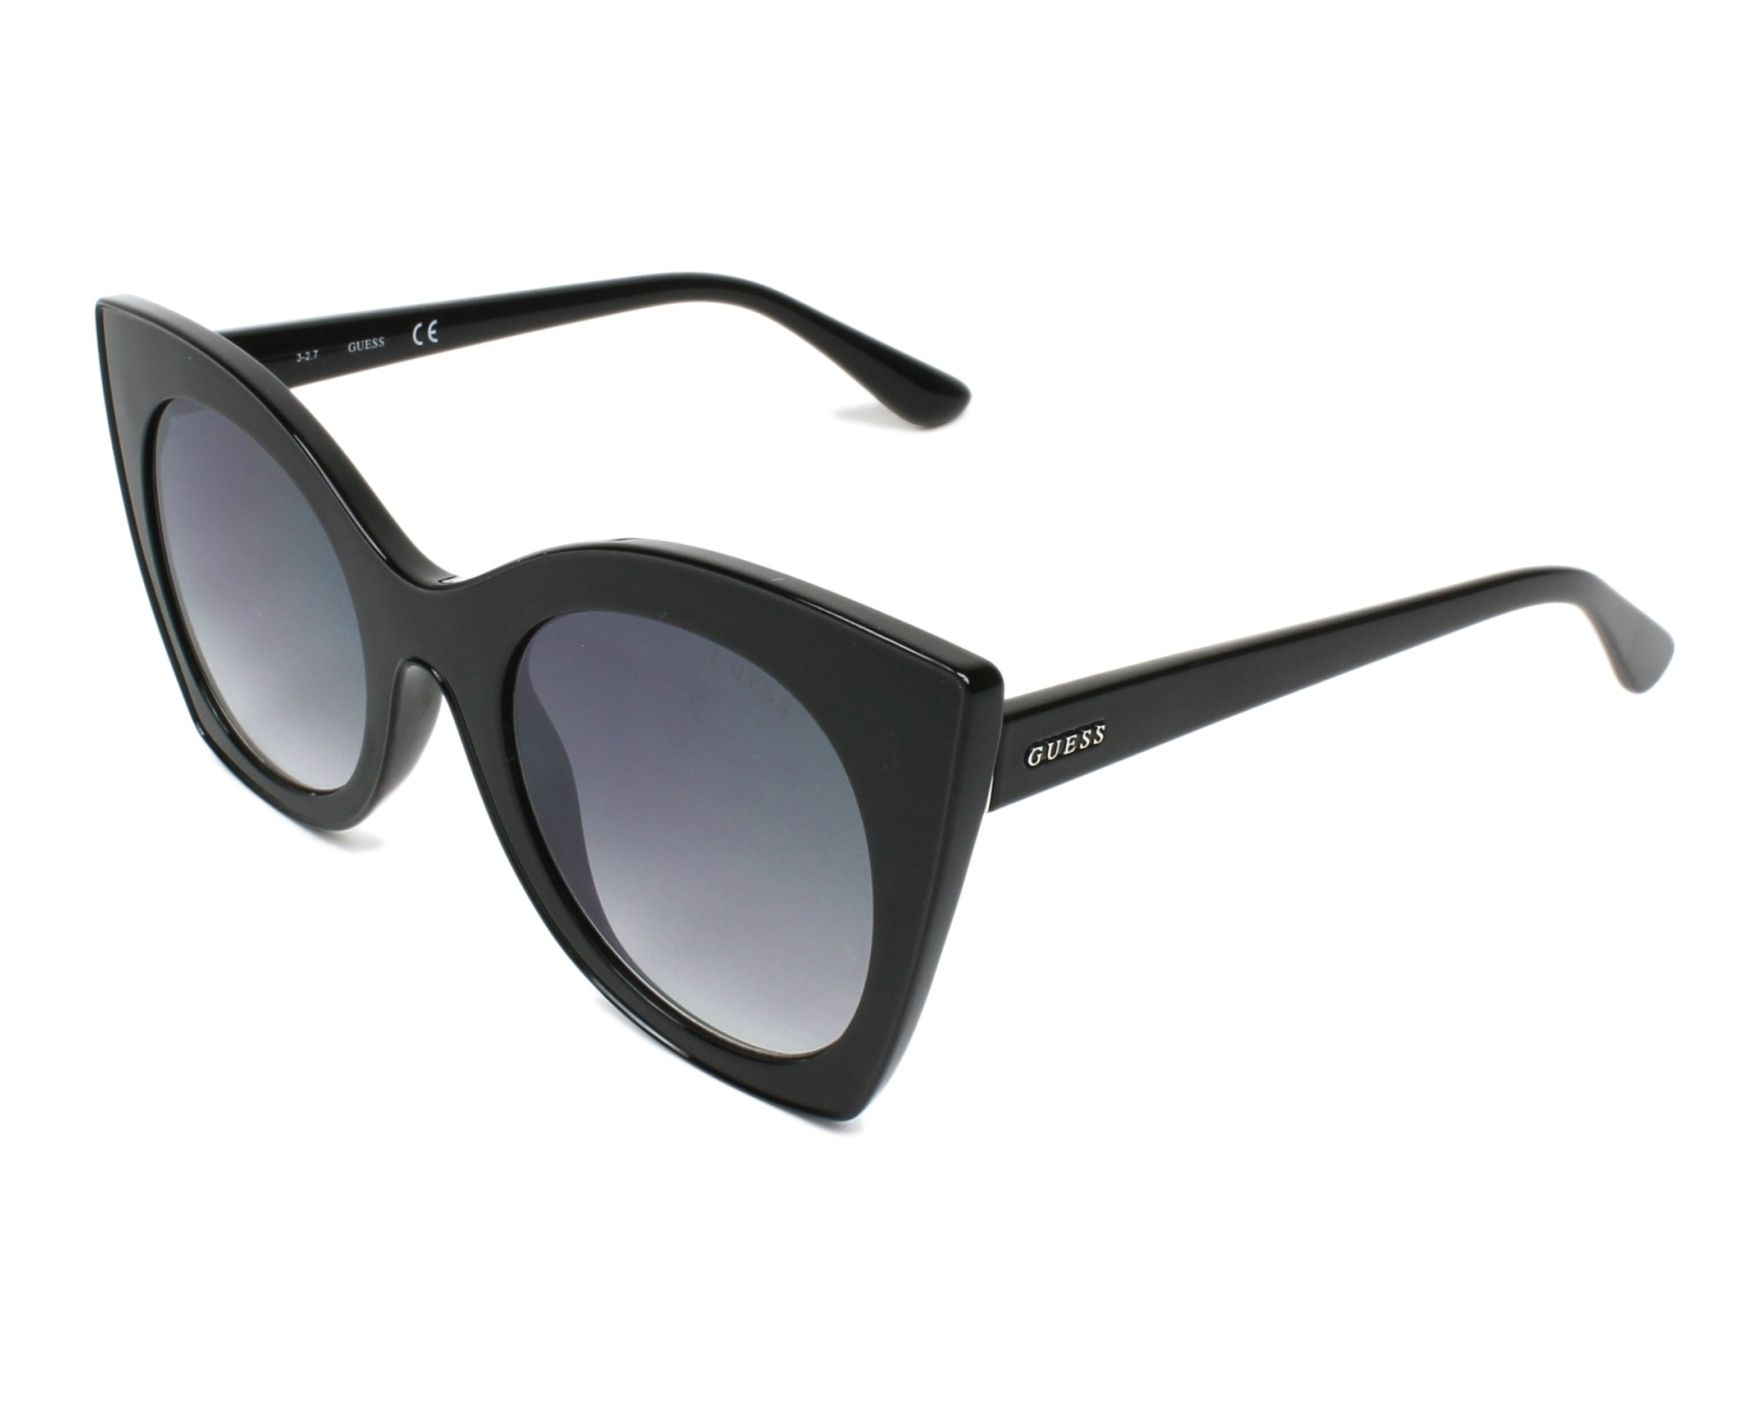 65fe3c5ae5991 Sunglasses Guess GU-7525 01B 51-23 Black profile view